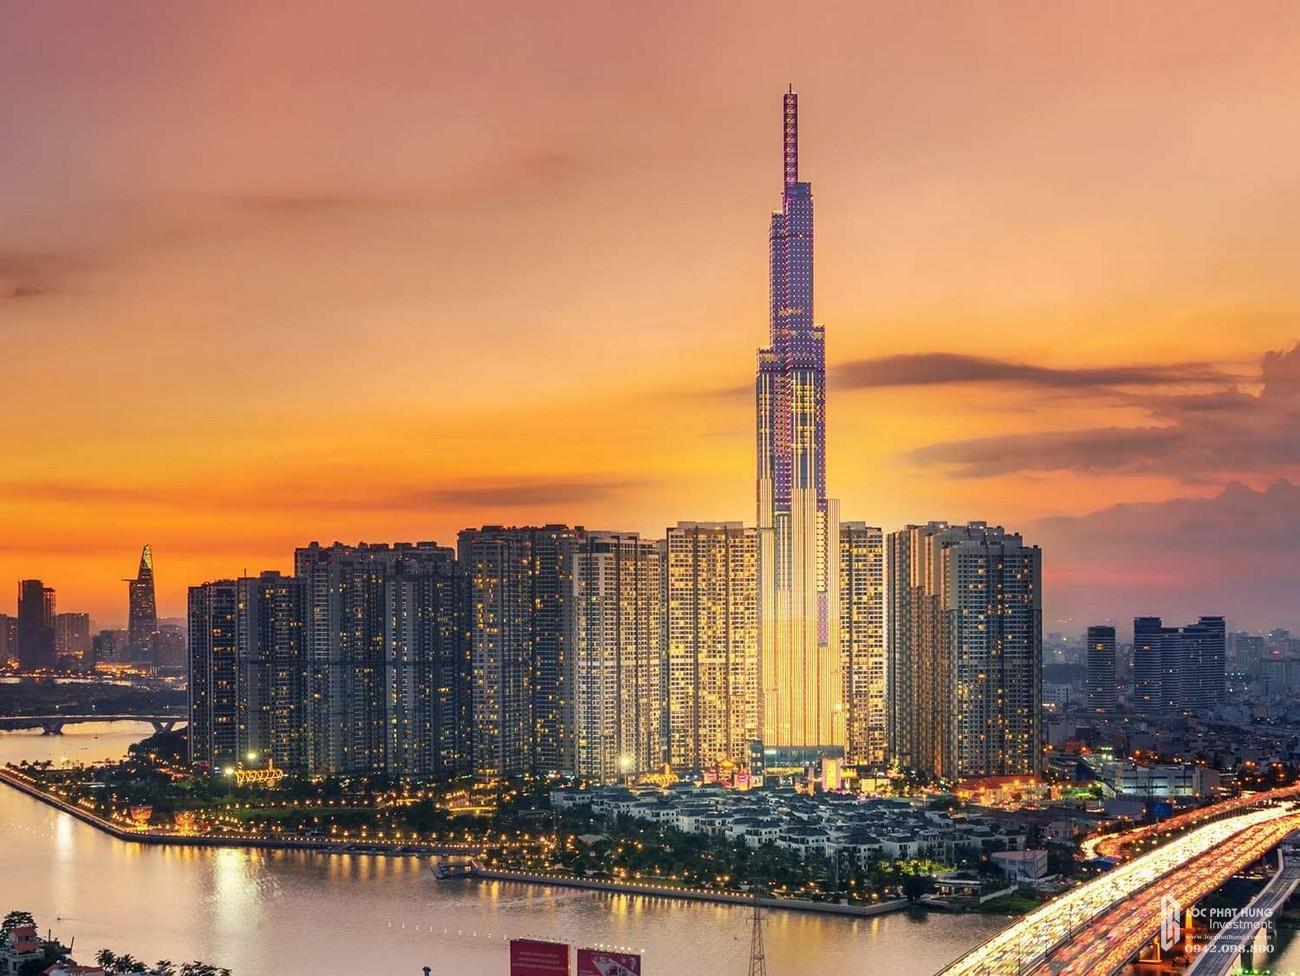 Tòa tháp cao nhất Việt Nam Landmark 81